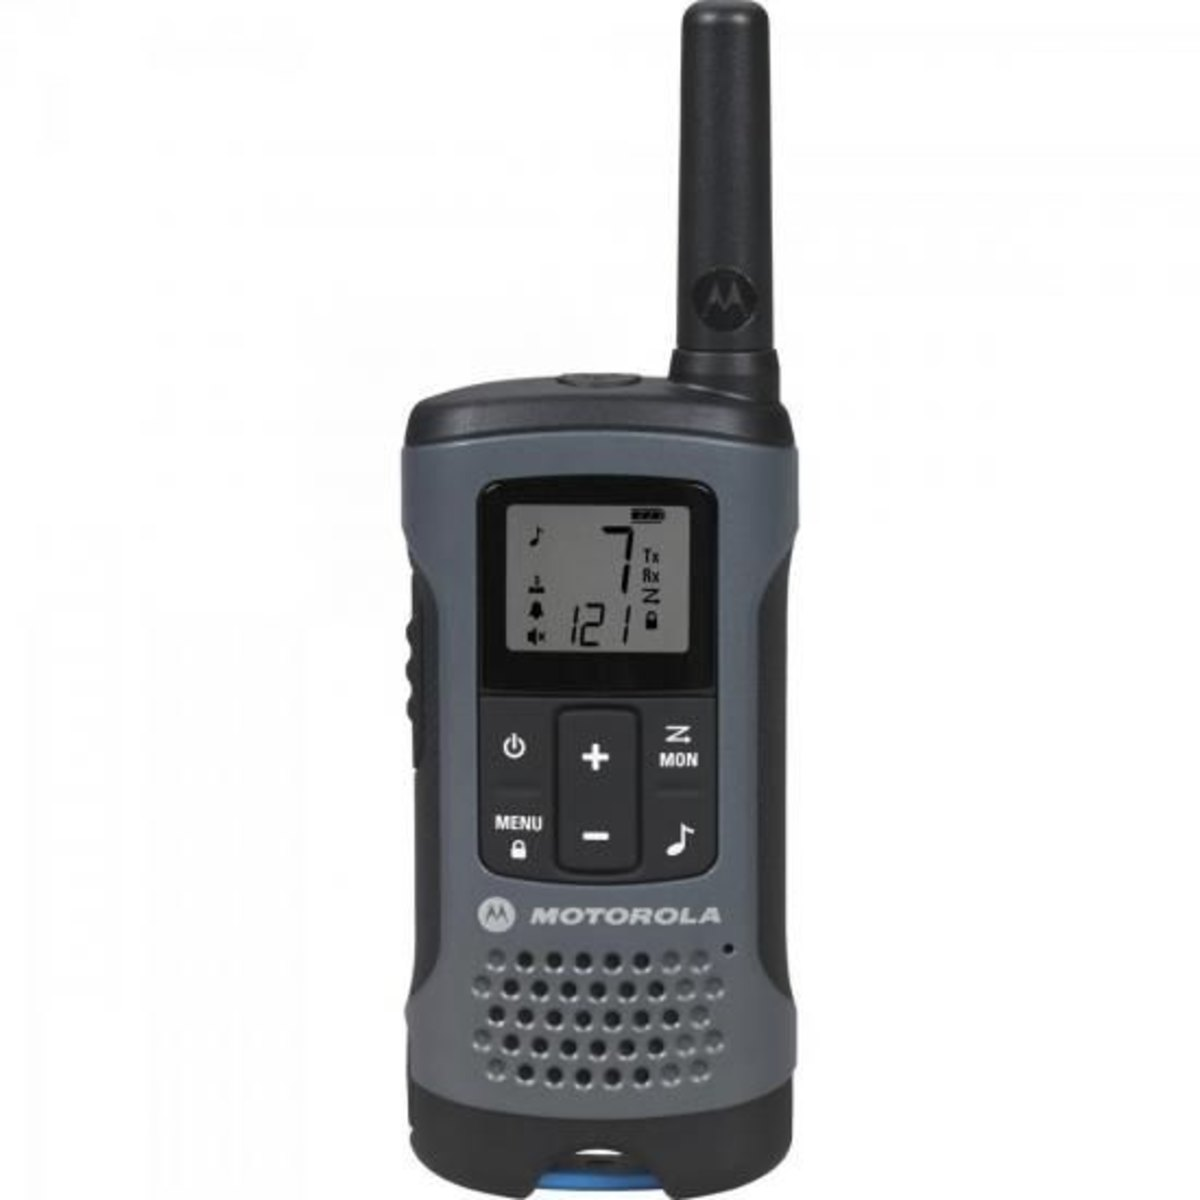 Fone profissional com ptt de lapela e microfone para Motorola Talkabout